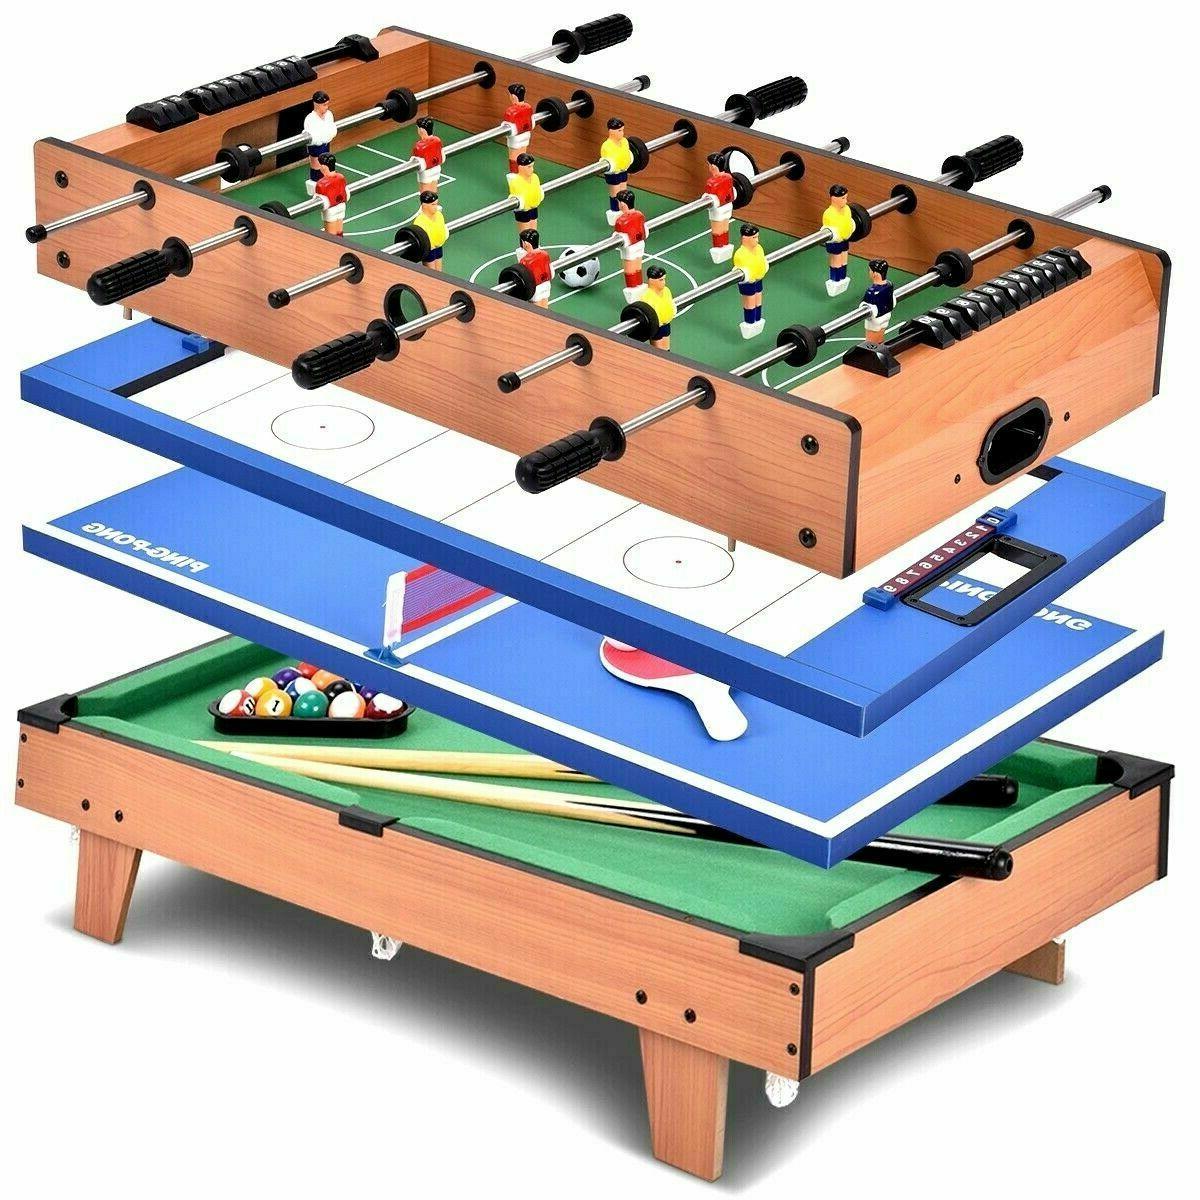 4 in 1 Multi Game Swivel Table Set Billiards/Pool, Foosball,